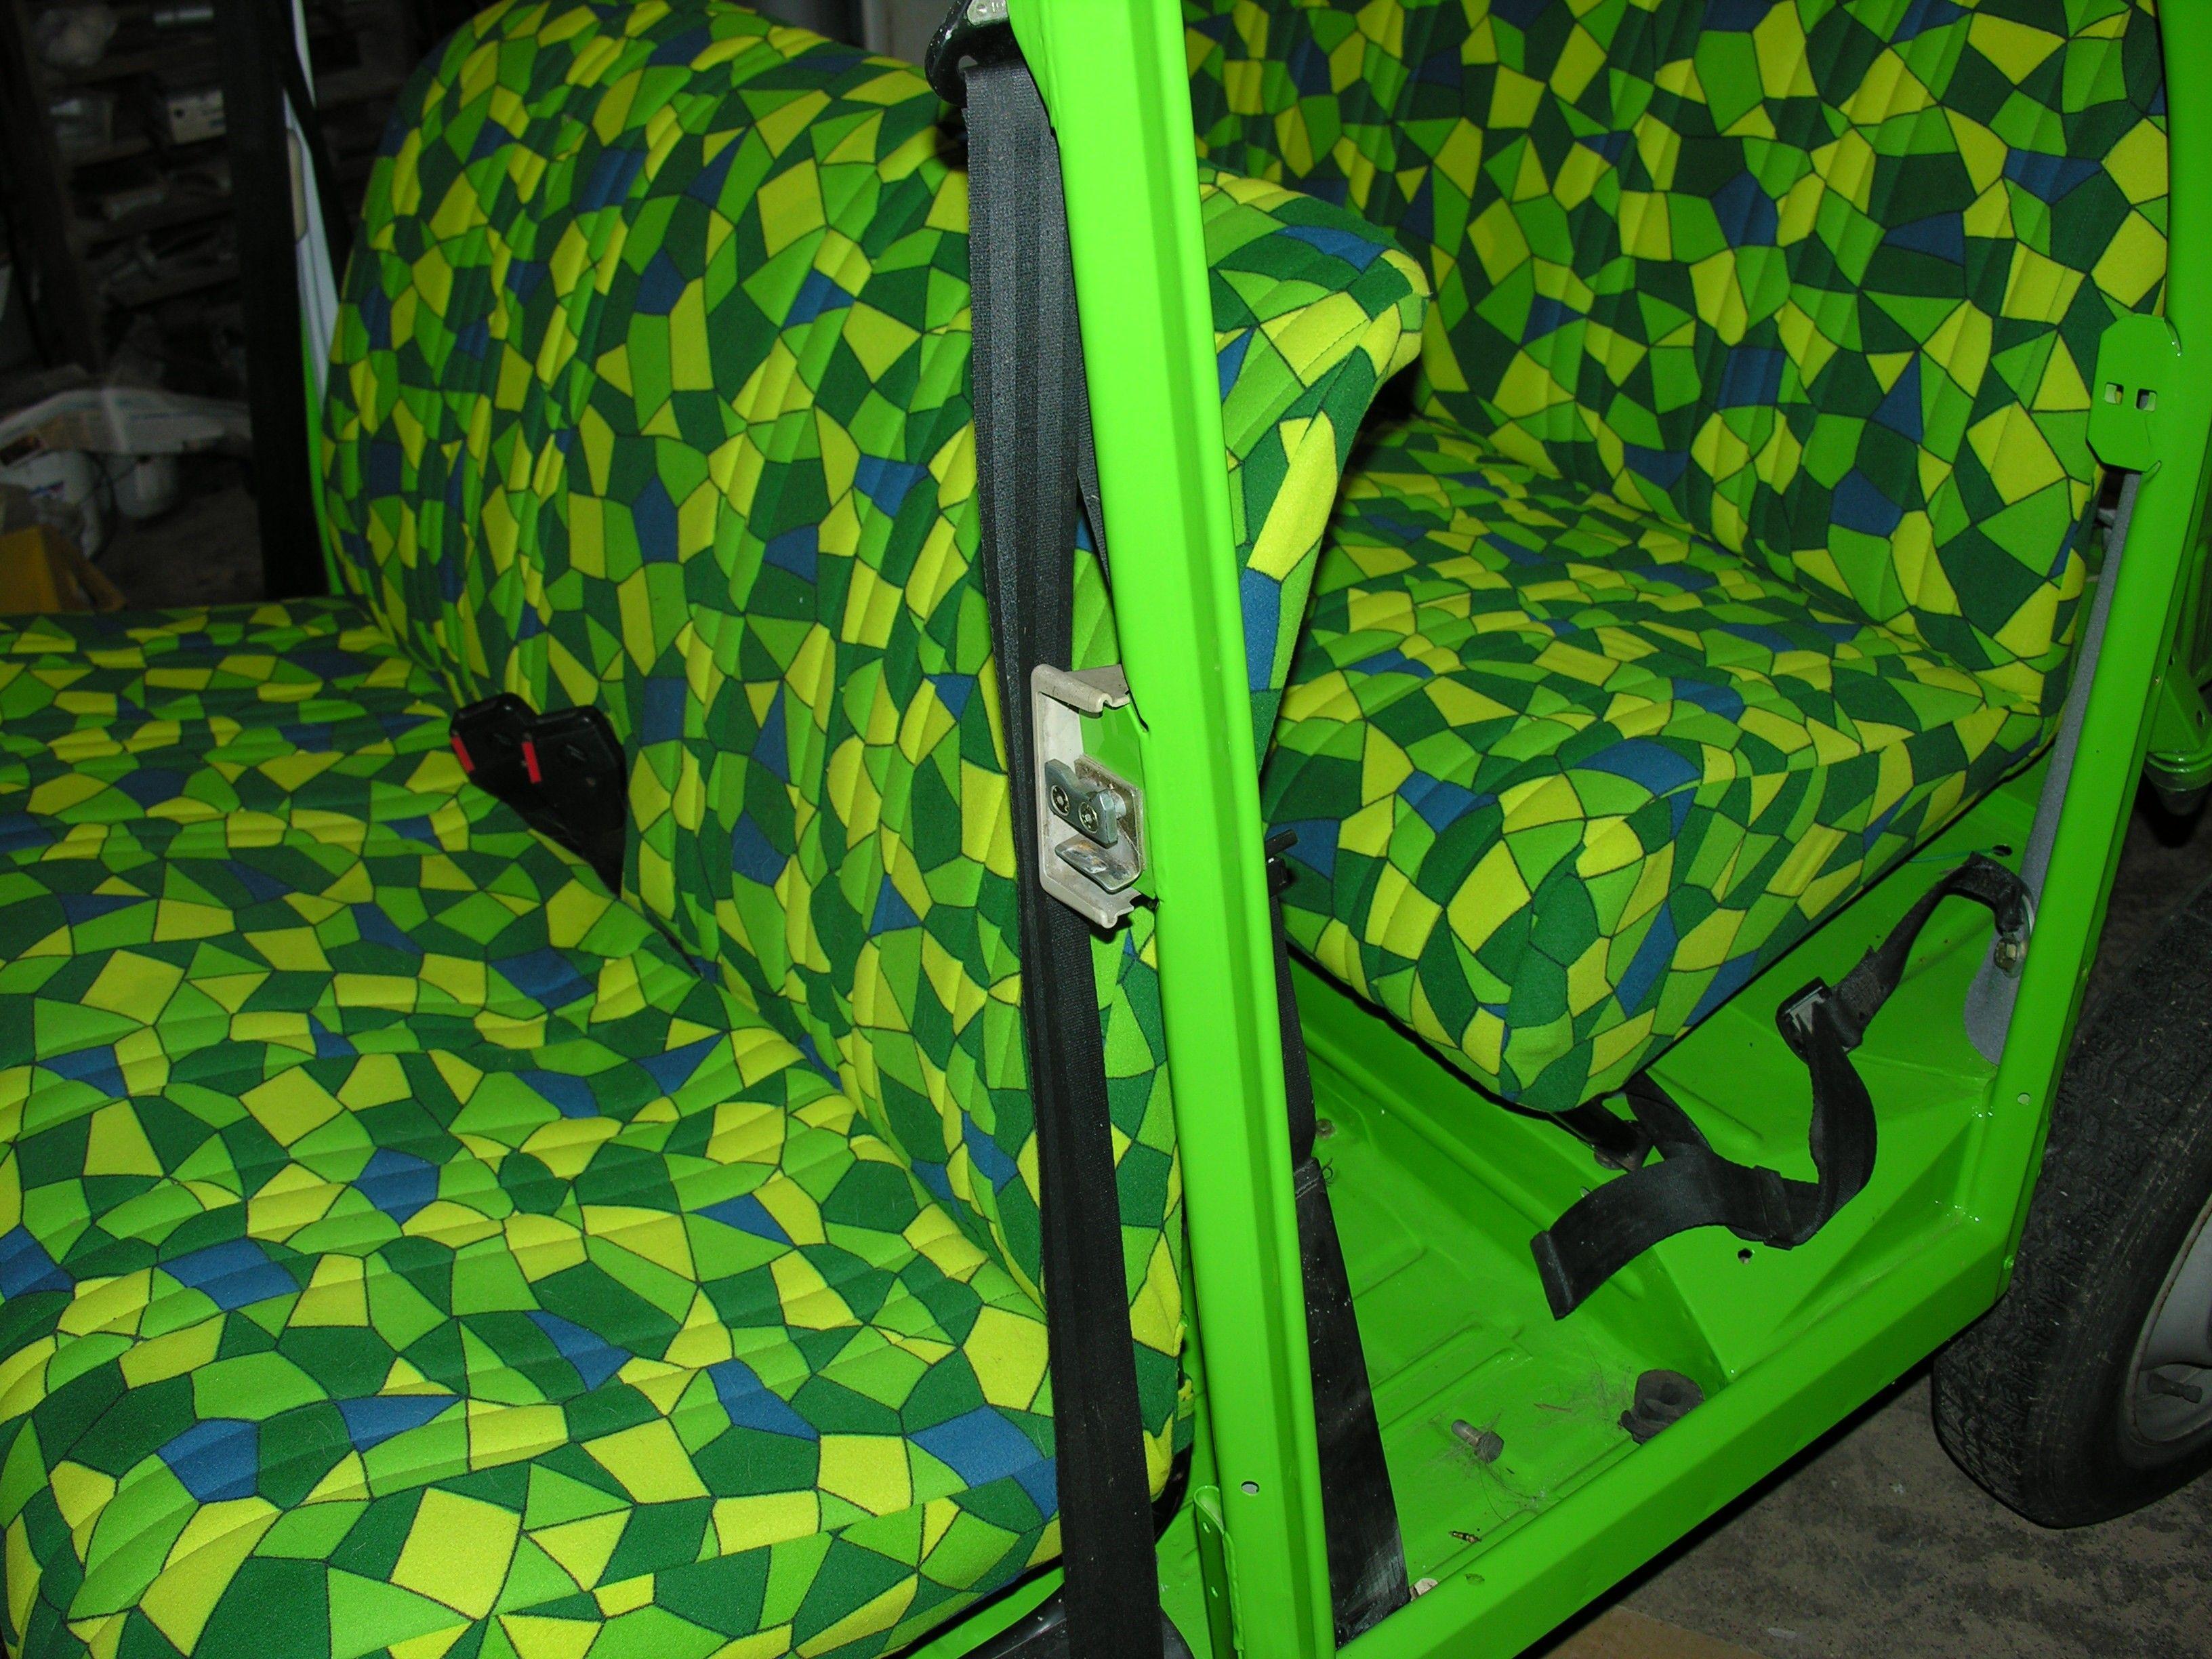 2cv vert palmeraie 2cv citro n 2cv 2cv citroen et citro n. Black Bedroom Furniture Sets. Home Design Ideas